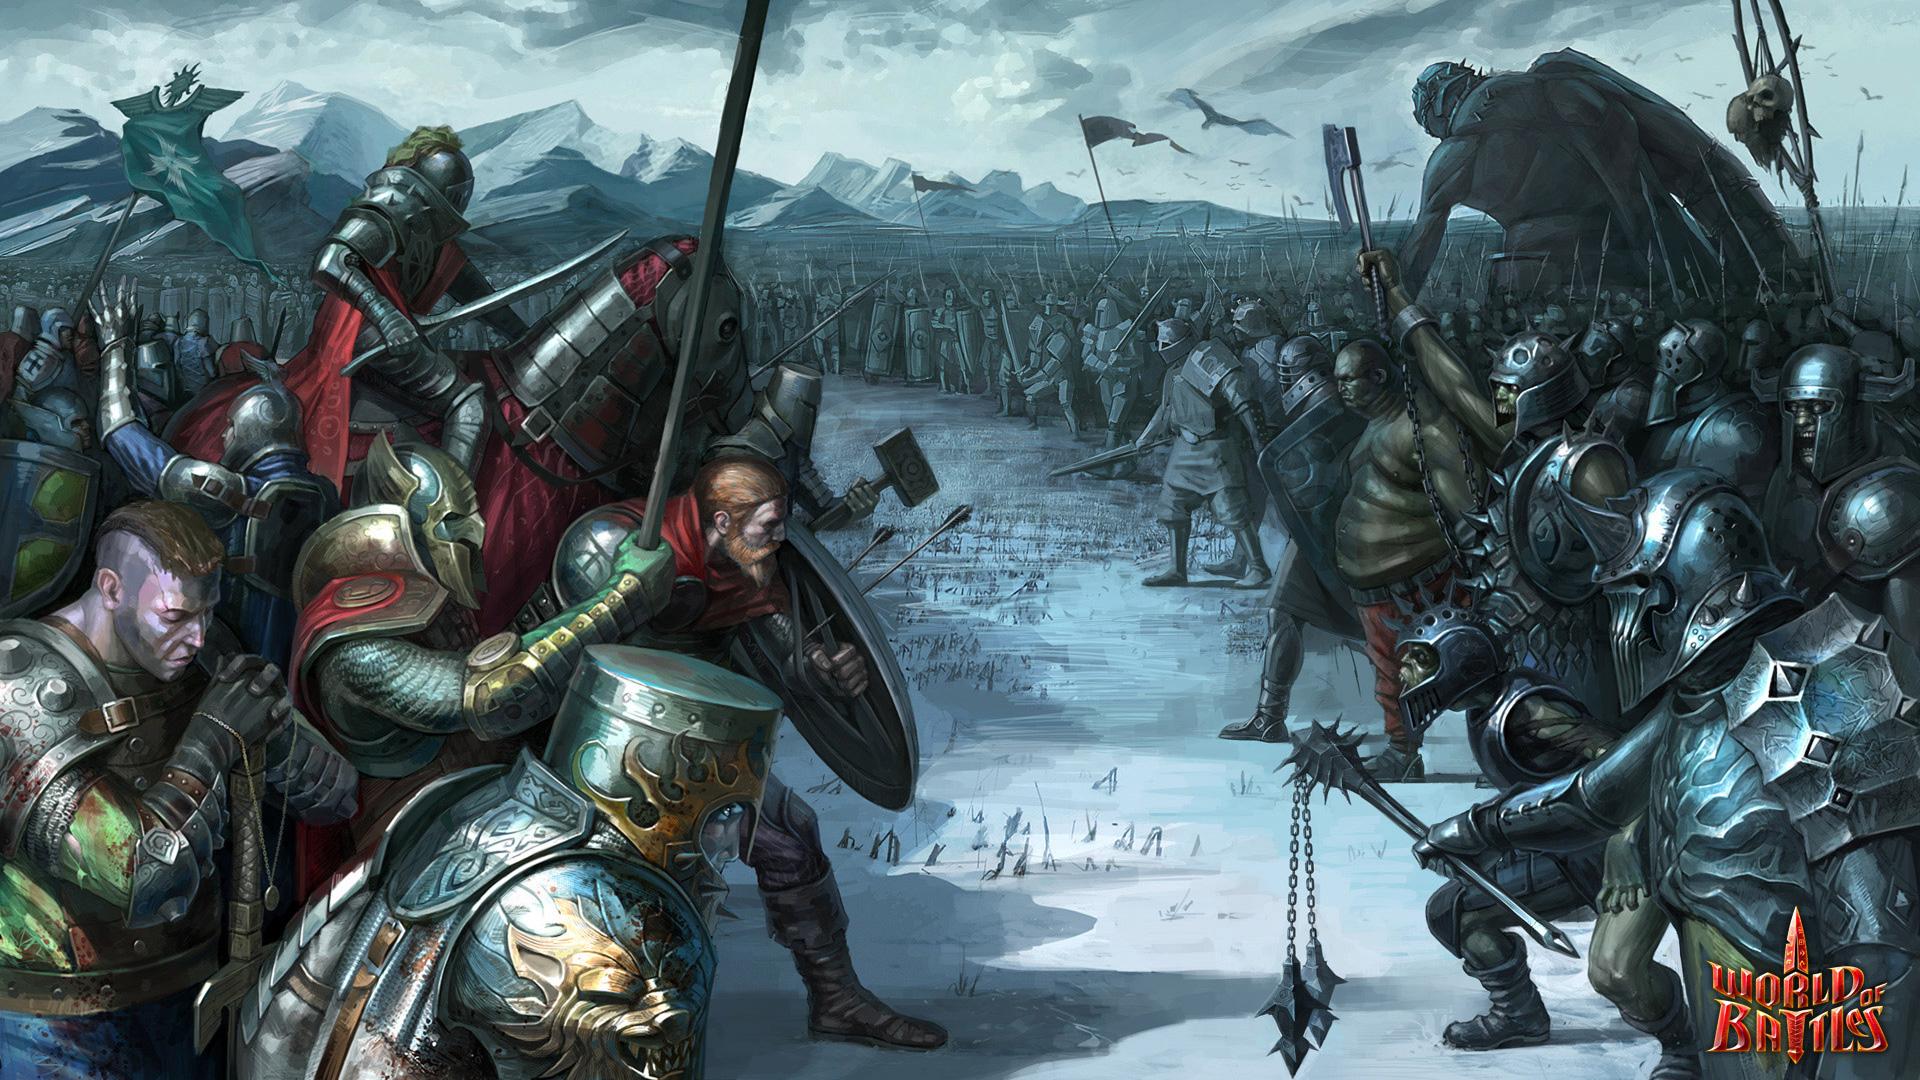 Free World of Battles Wallpaper in 1920x1080